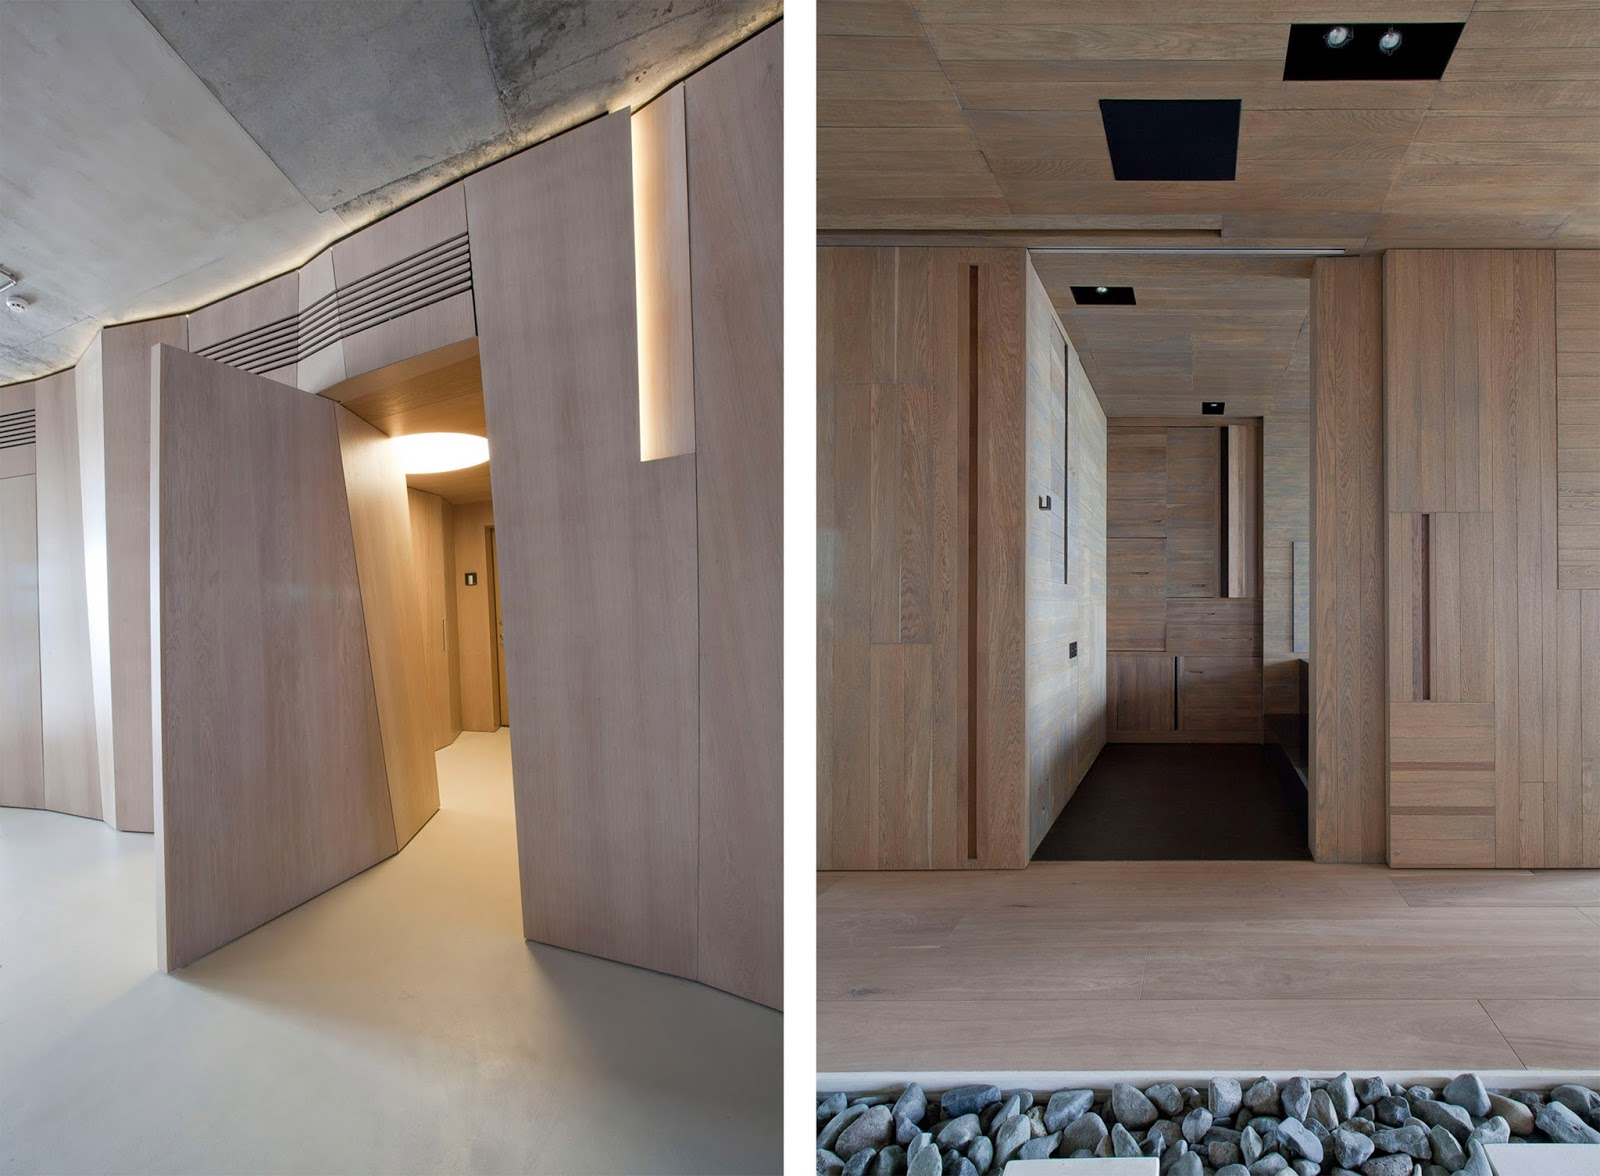 Letto legno giapponese tabanan casa del bamb hazukashi for Legno giapponese